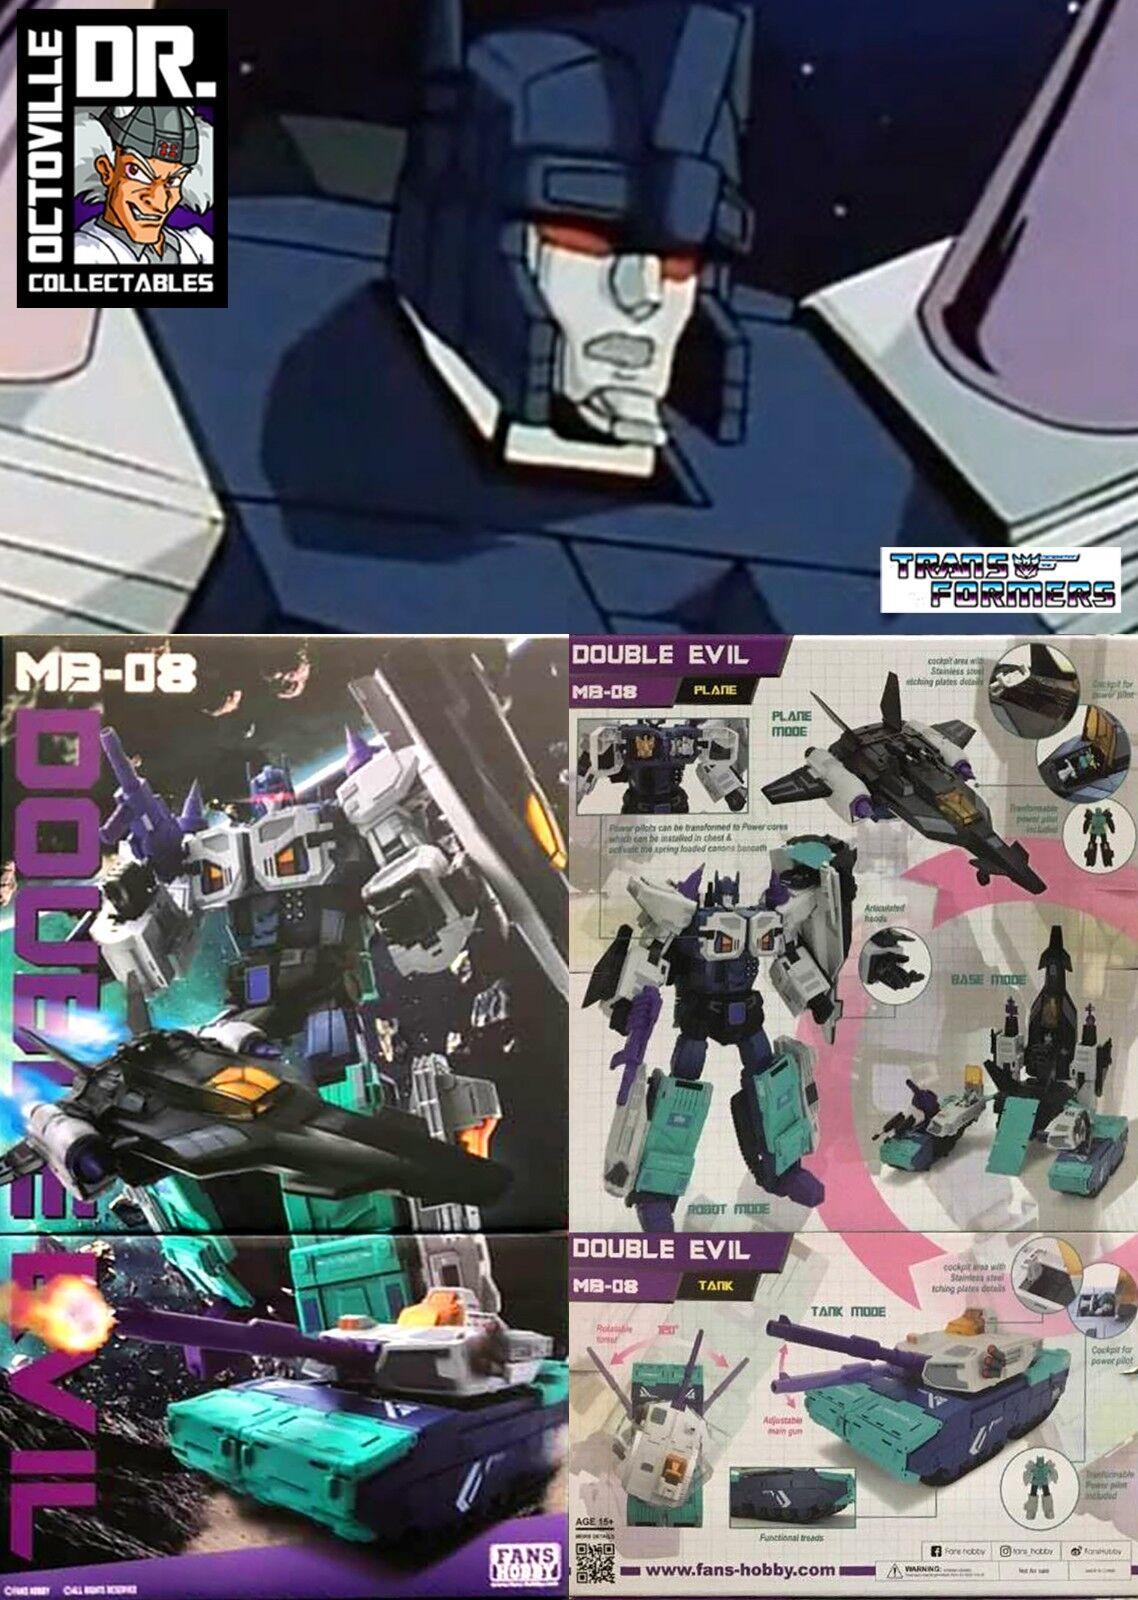 más descuento Transformers obra maestra Fans Fans Fans Hobby MB-08 doble mal MP Overlord Nuevo  Obtén lo ultimo